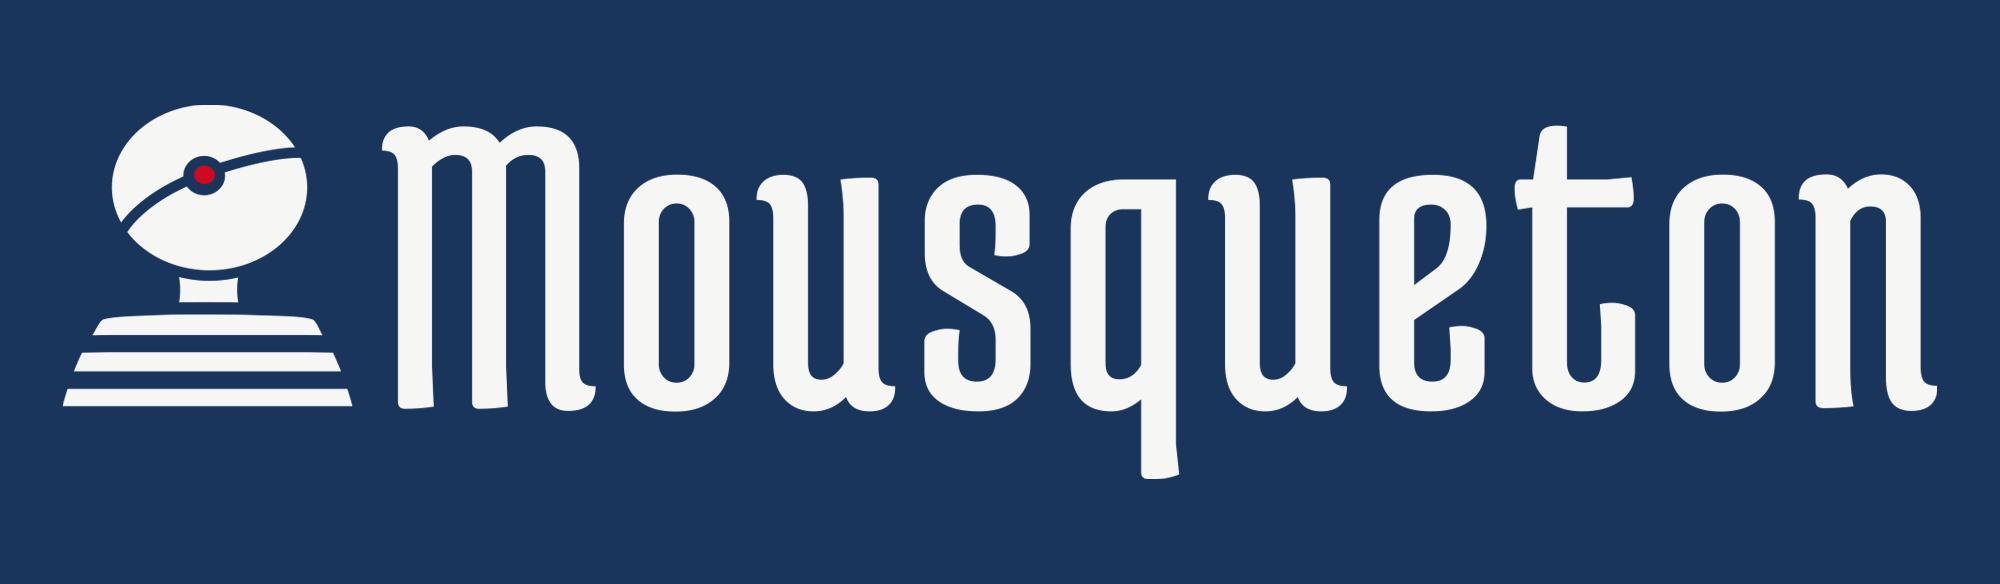 Logo Mousqueton